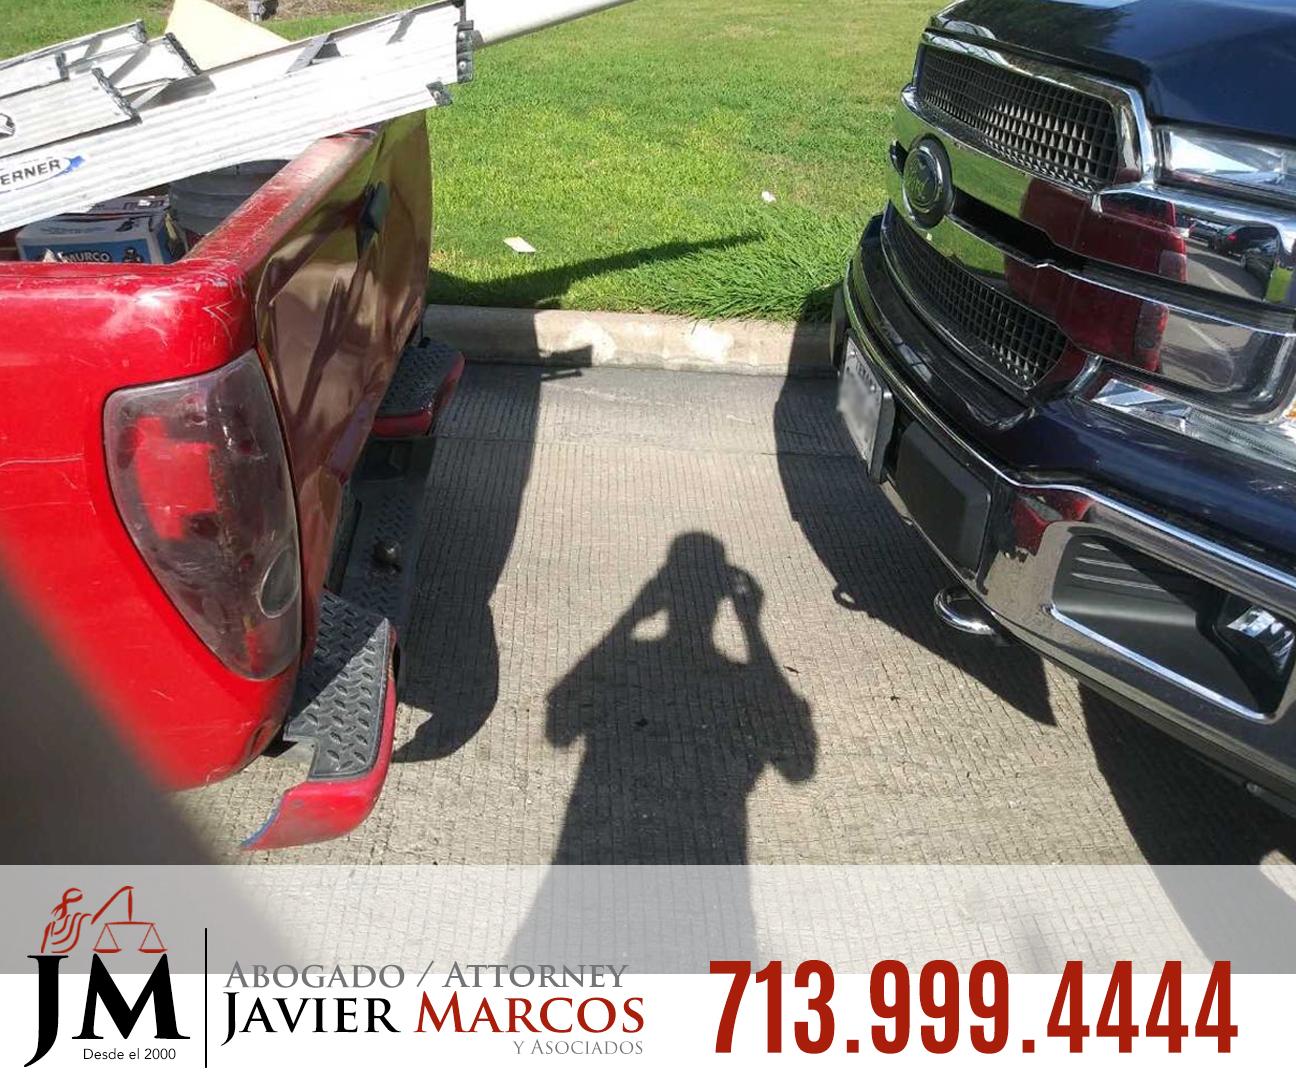 Abogado de Accidentes de Uber | Abogado Javier Marcos | 713.999.4444